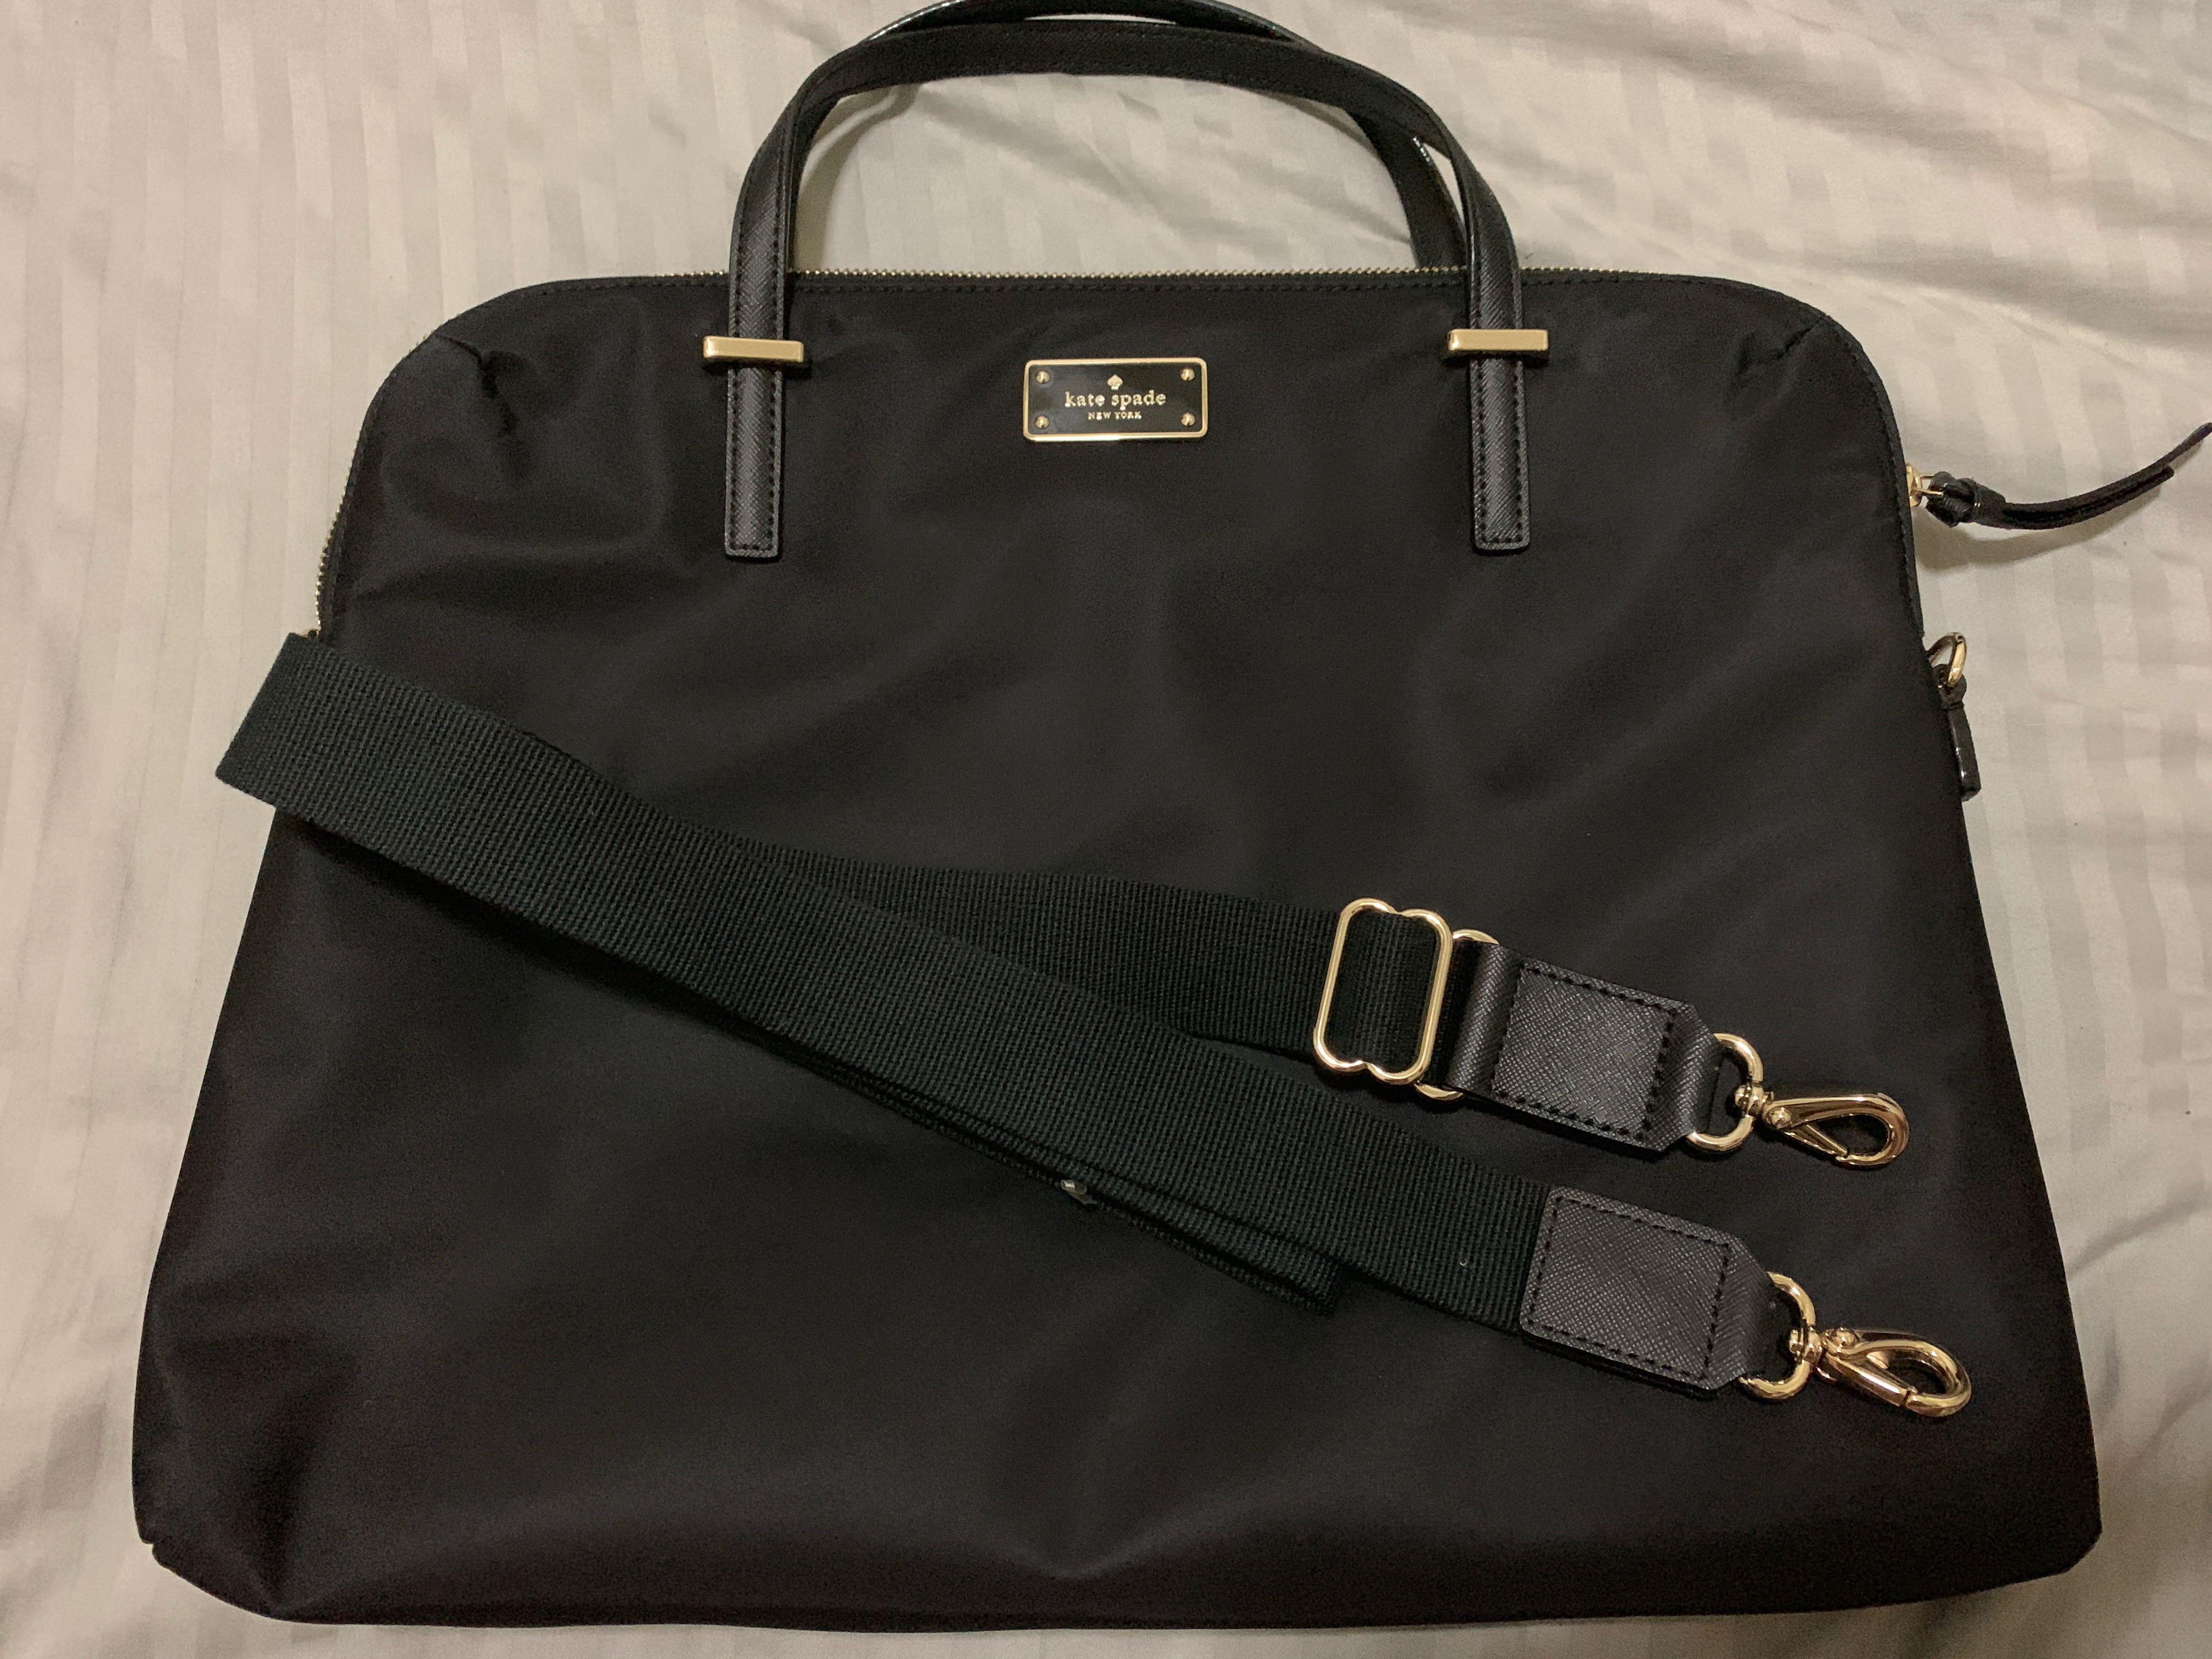 d71ba0192c6 Kate Spade Laptop Bag - 13 inch laptop size